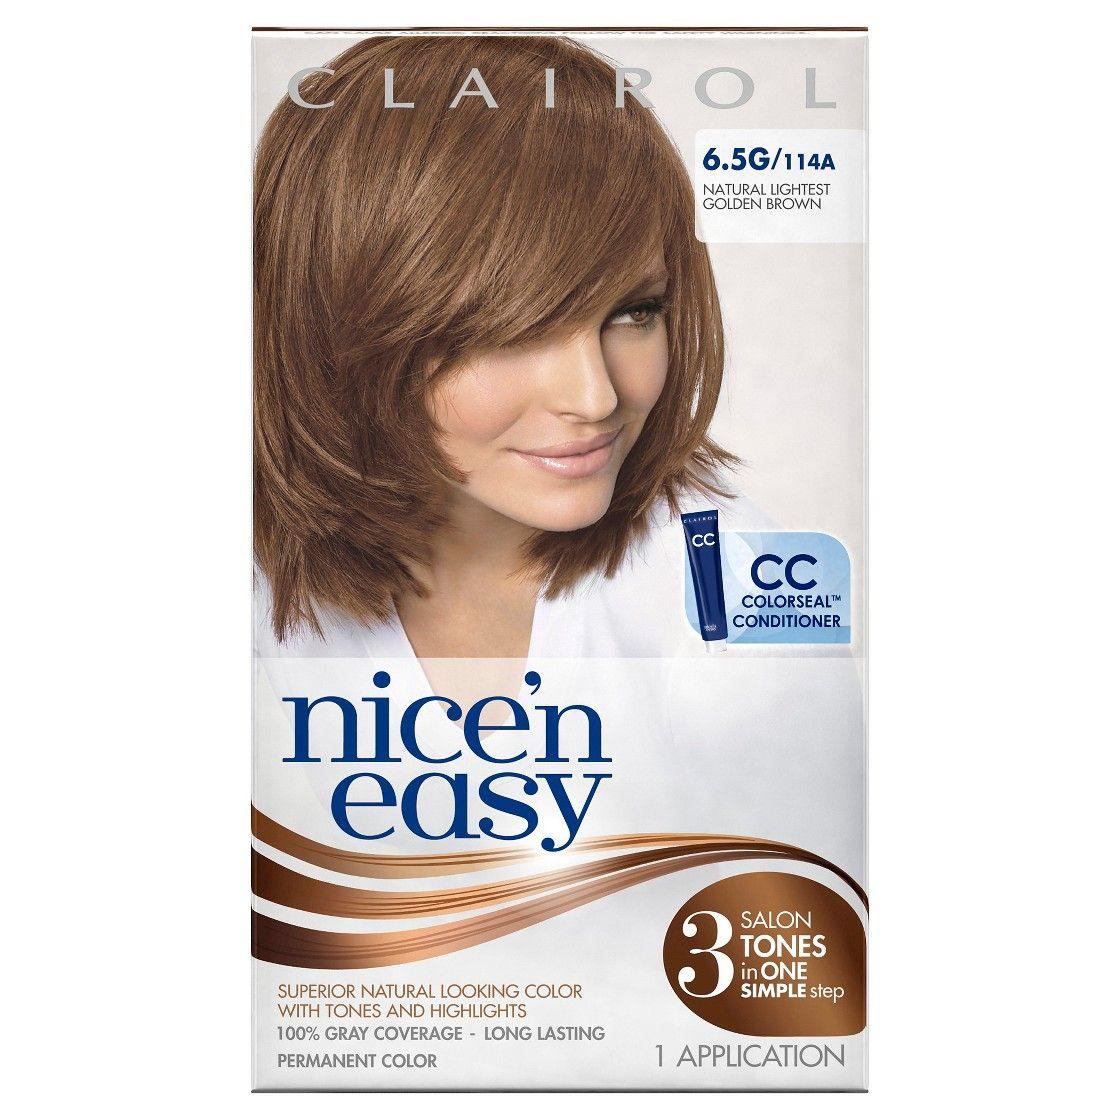 Light reddish brown hair dye